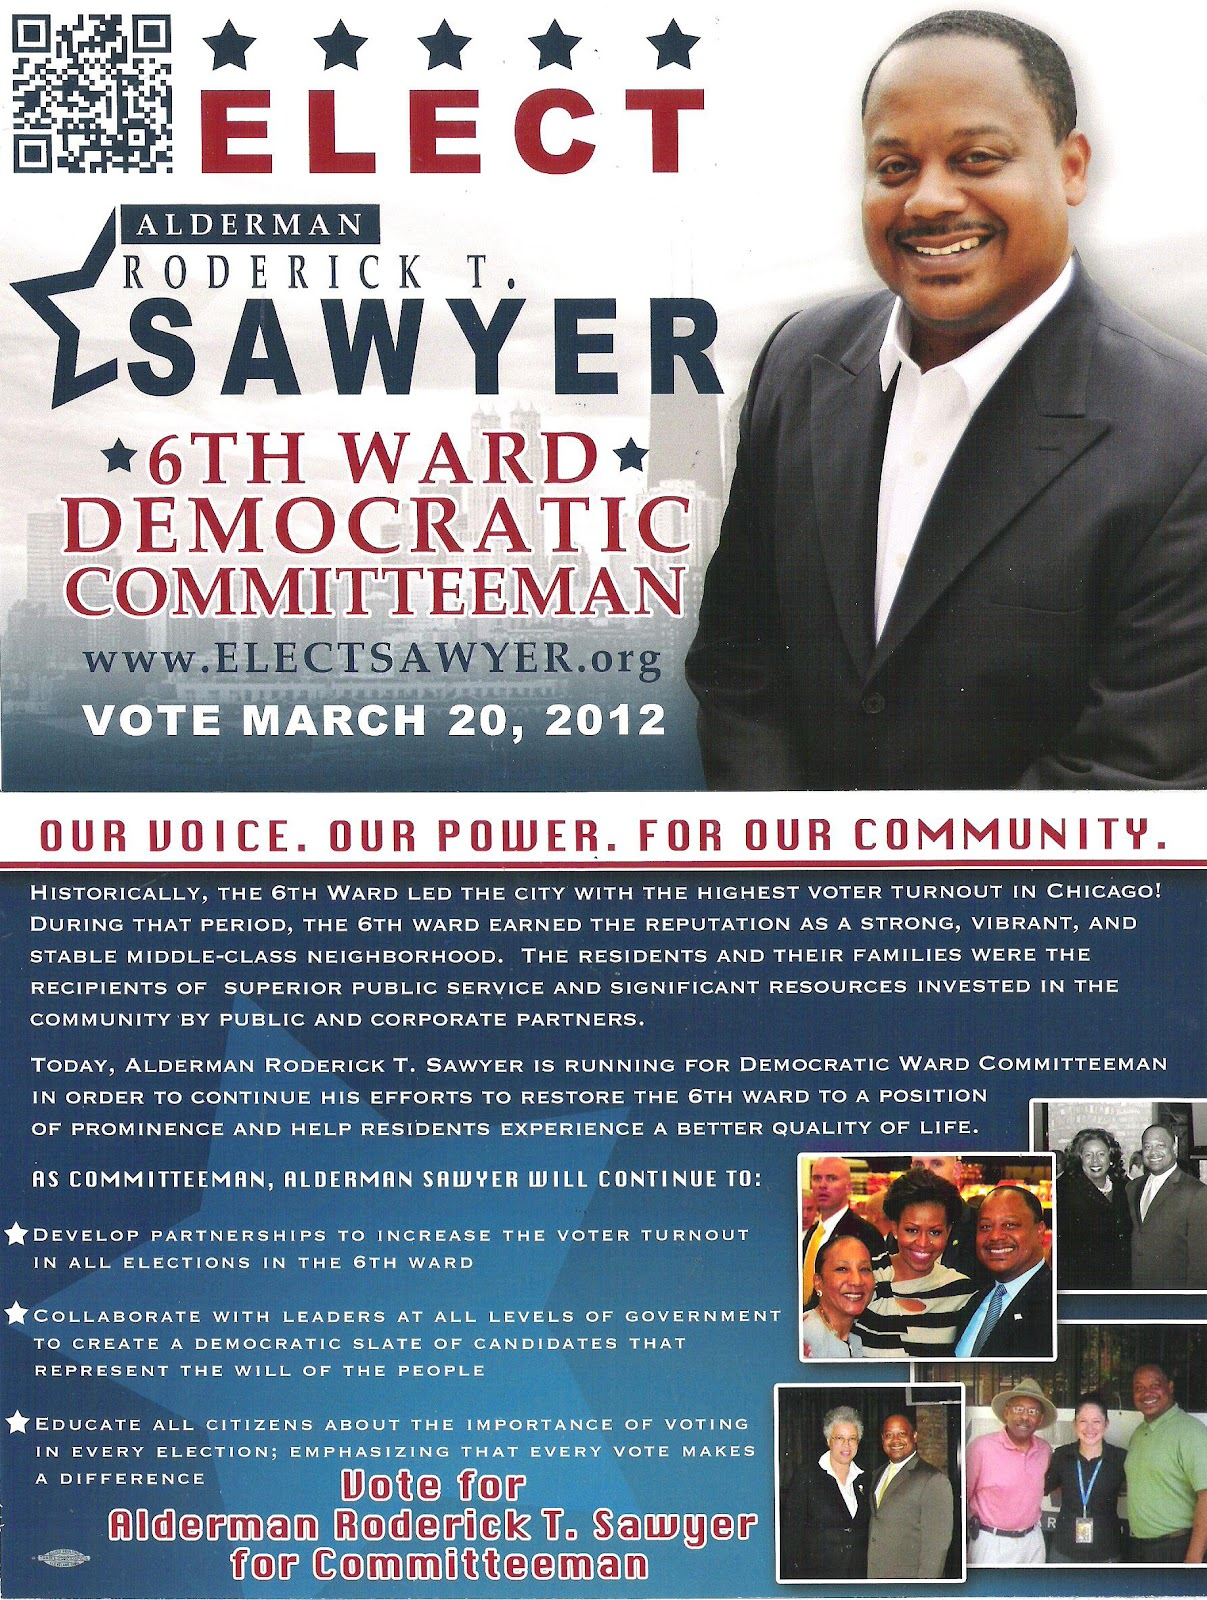 the sixth ward flyer and audio sixth ward democratic committeeman flyer and audio sixth ward democratic committeeman race